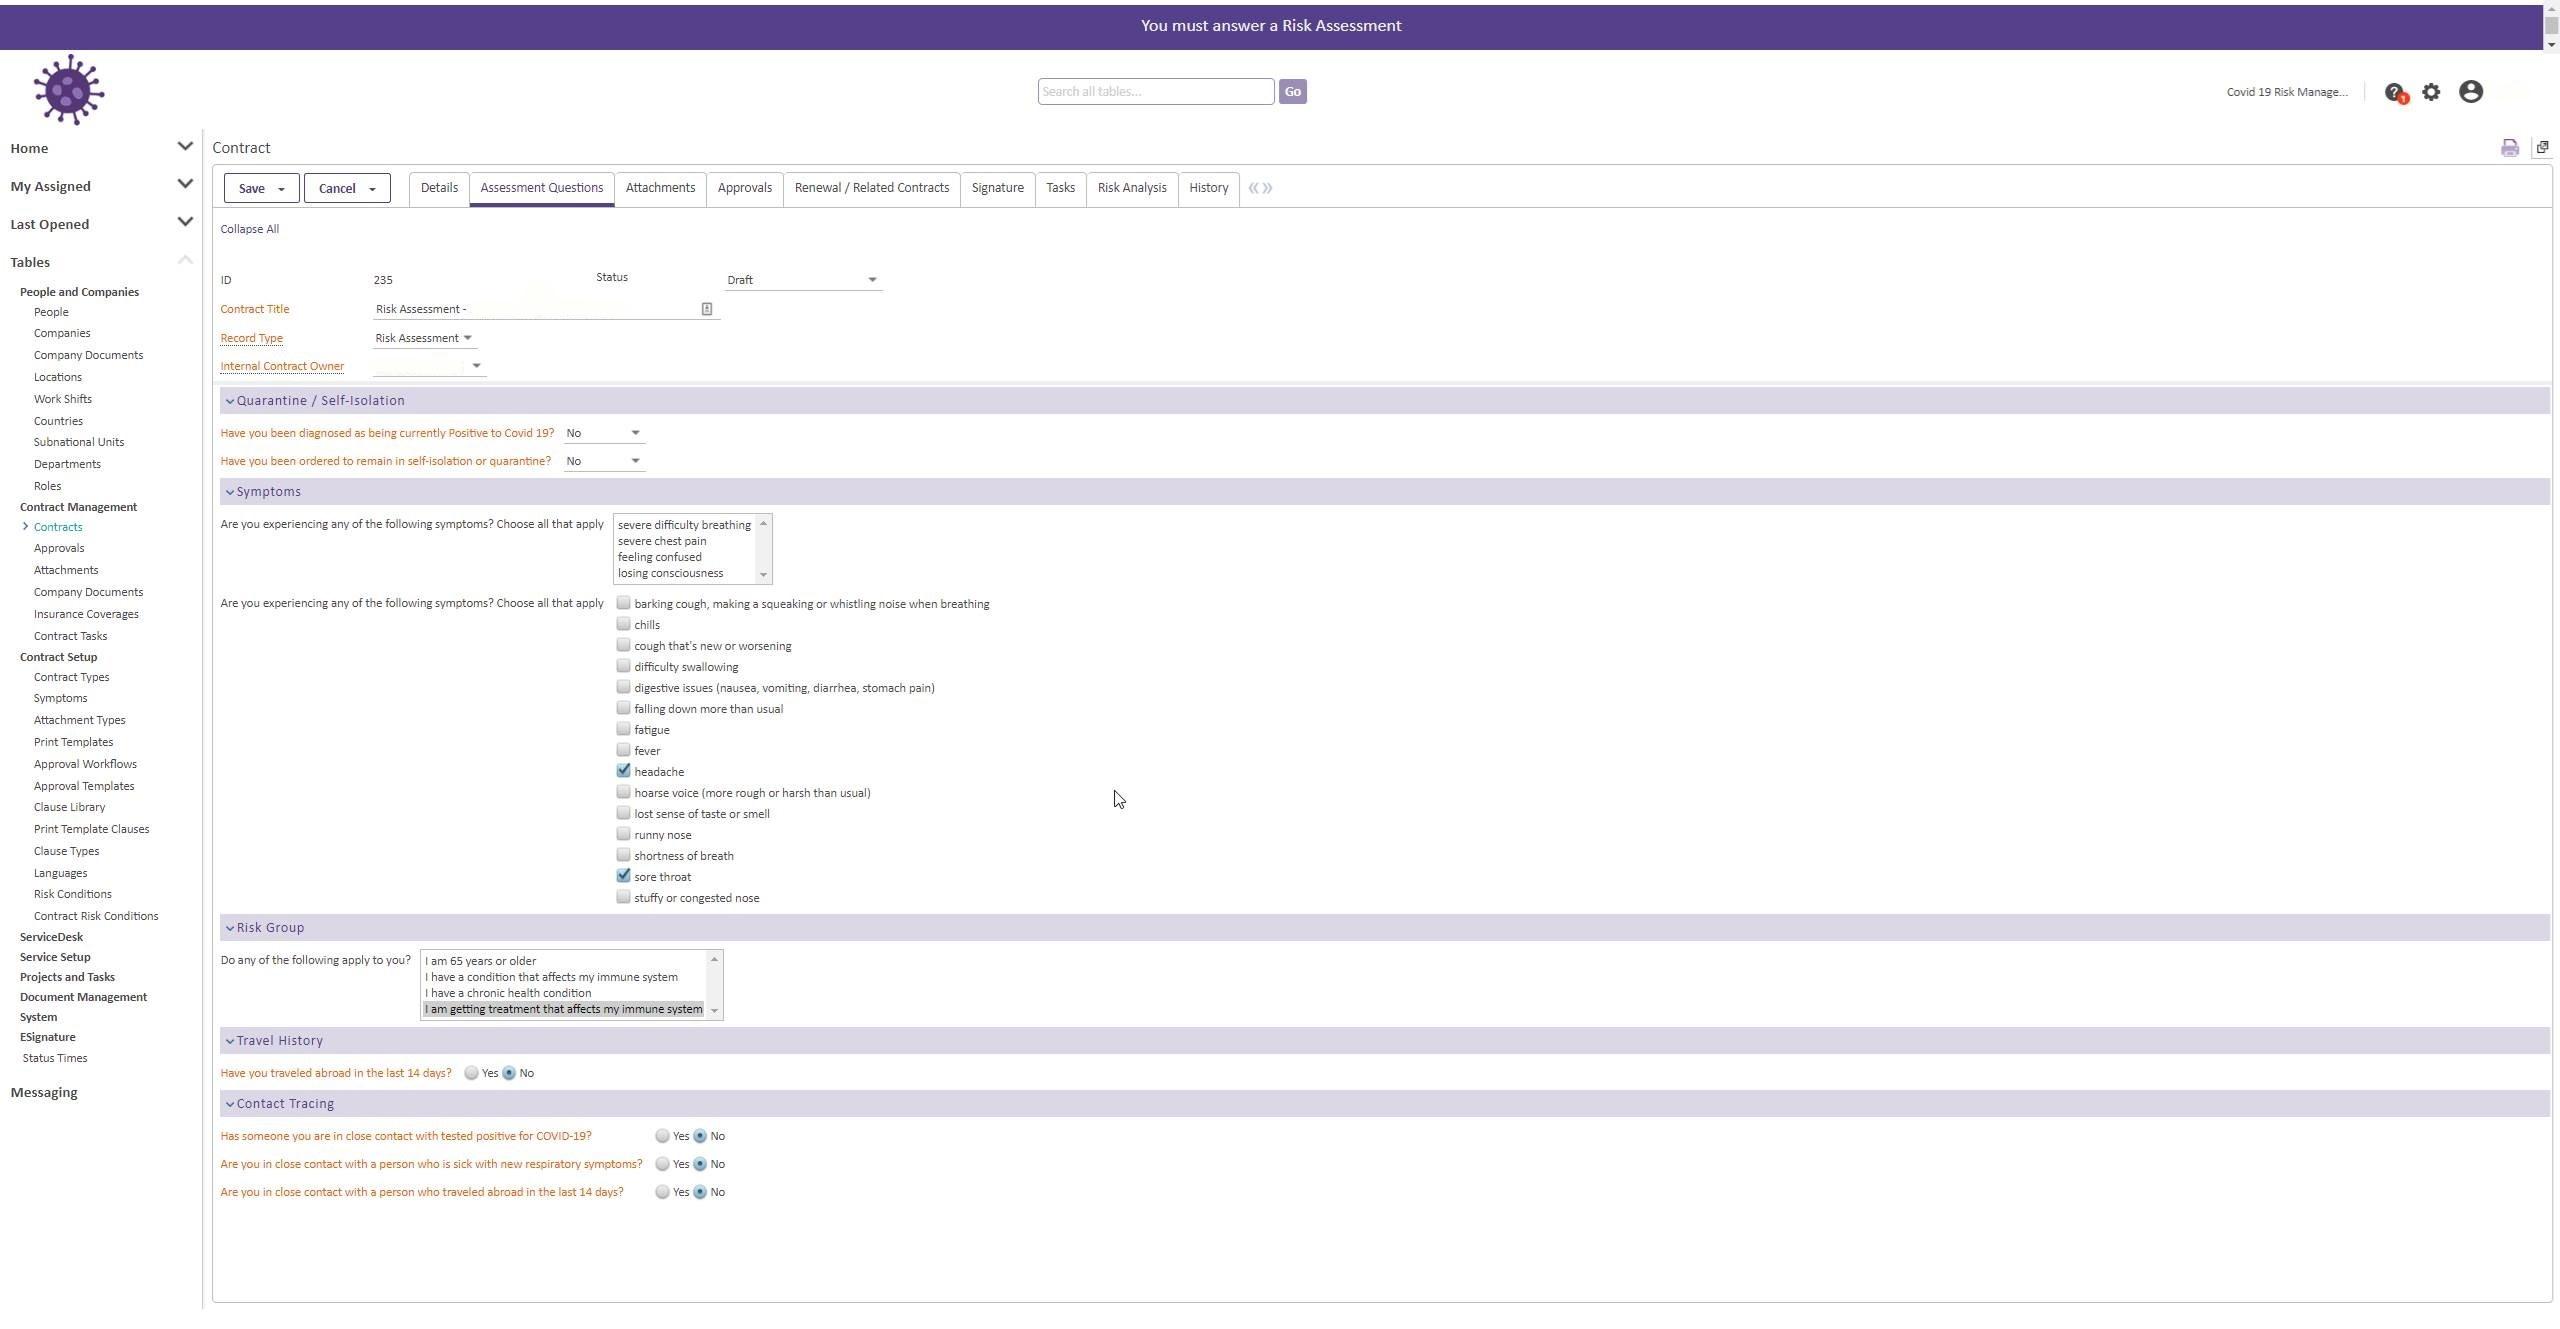 Agiloft COVID-19 Risk Assessment functionality